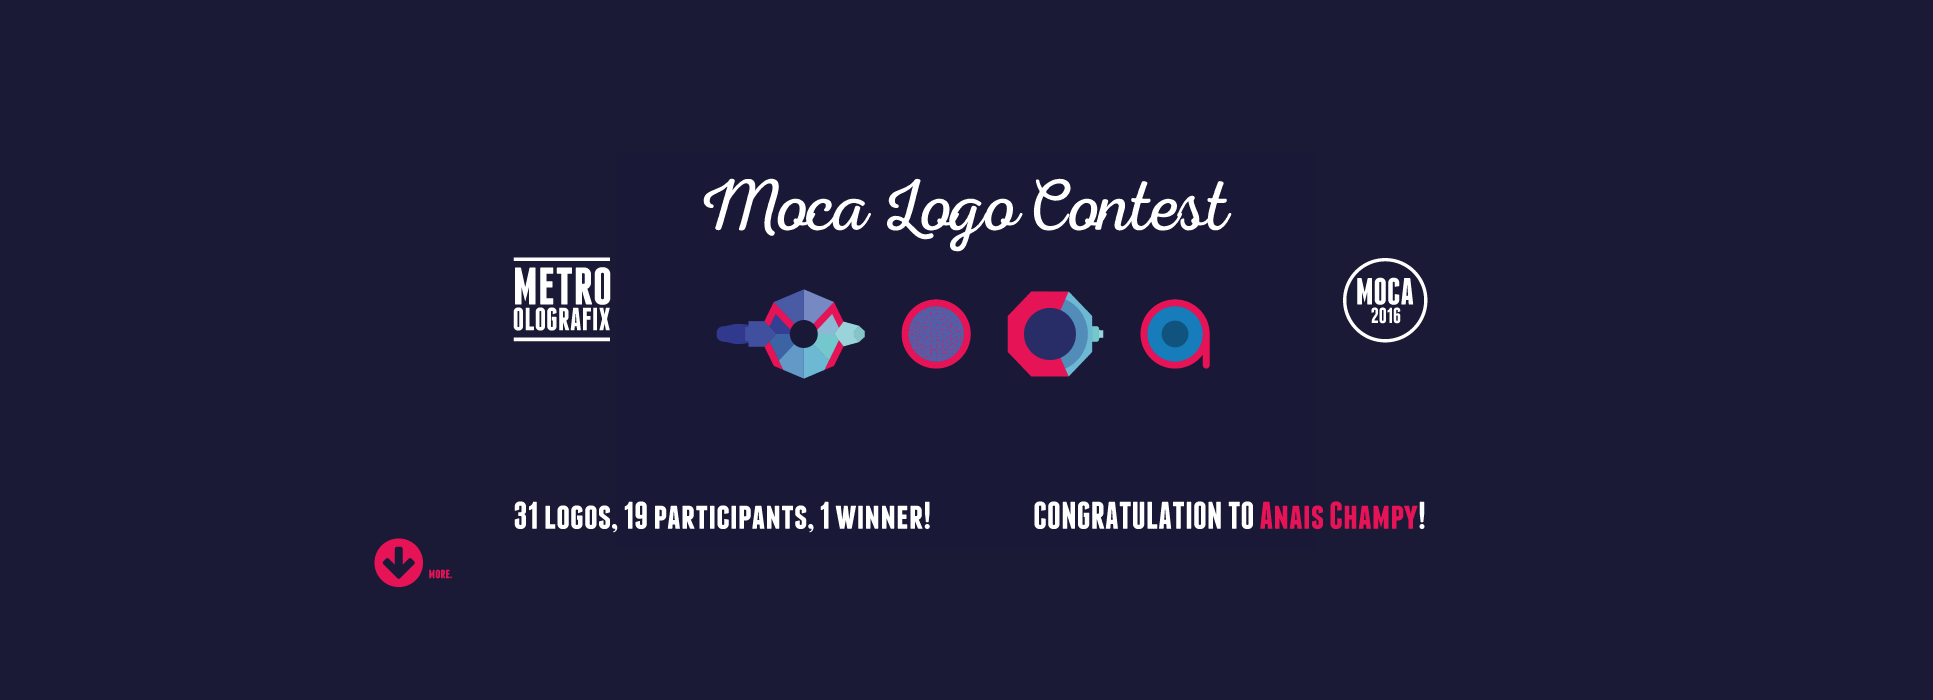 MOCA16 winner contest